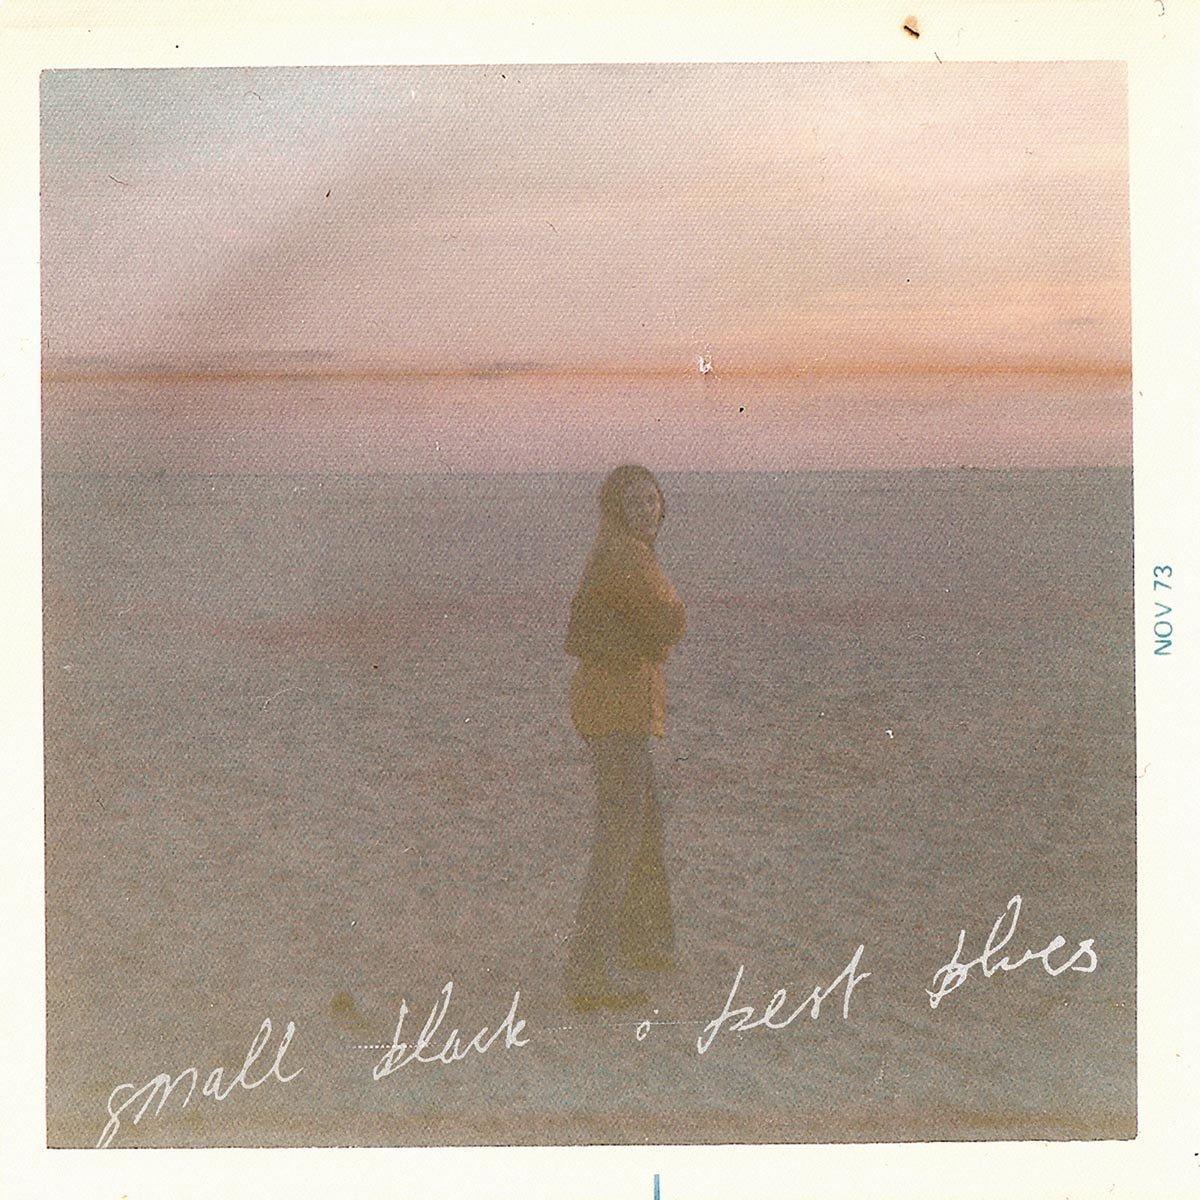 Vinilo : Small Black - Best Blues (Clear Vinyl)